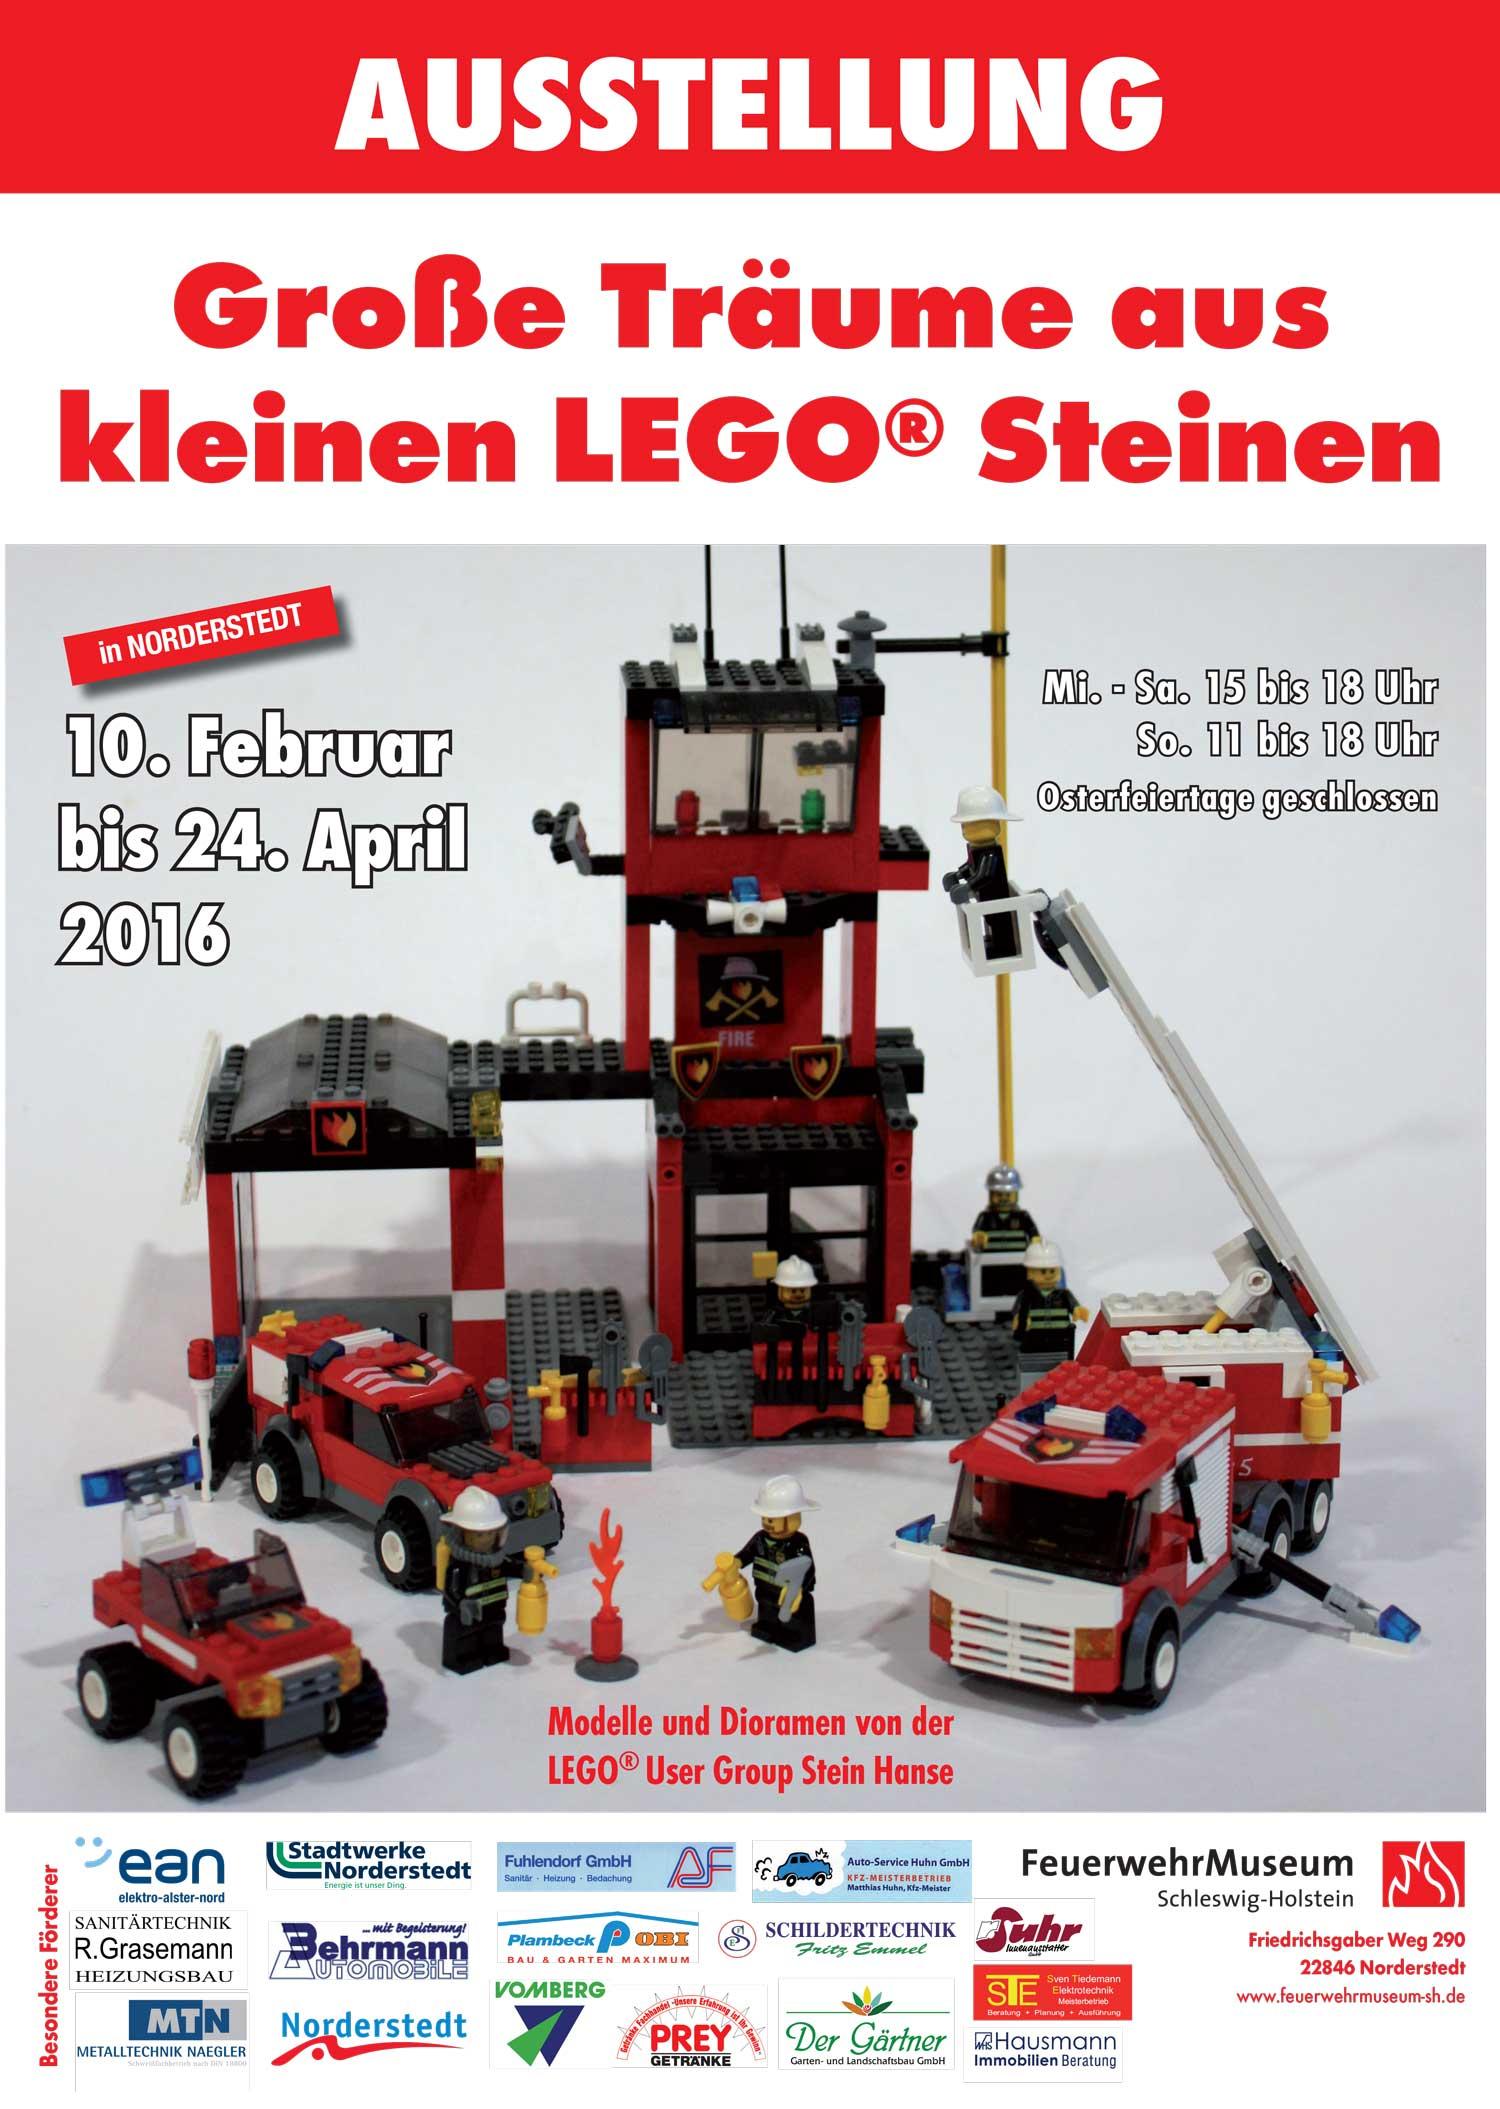 LEGO---Plakat.jpg